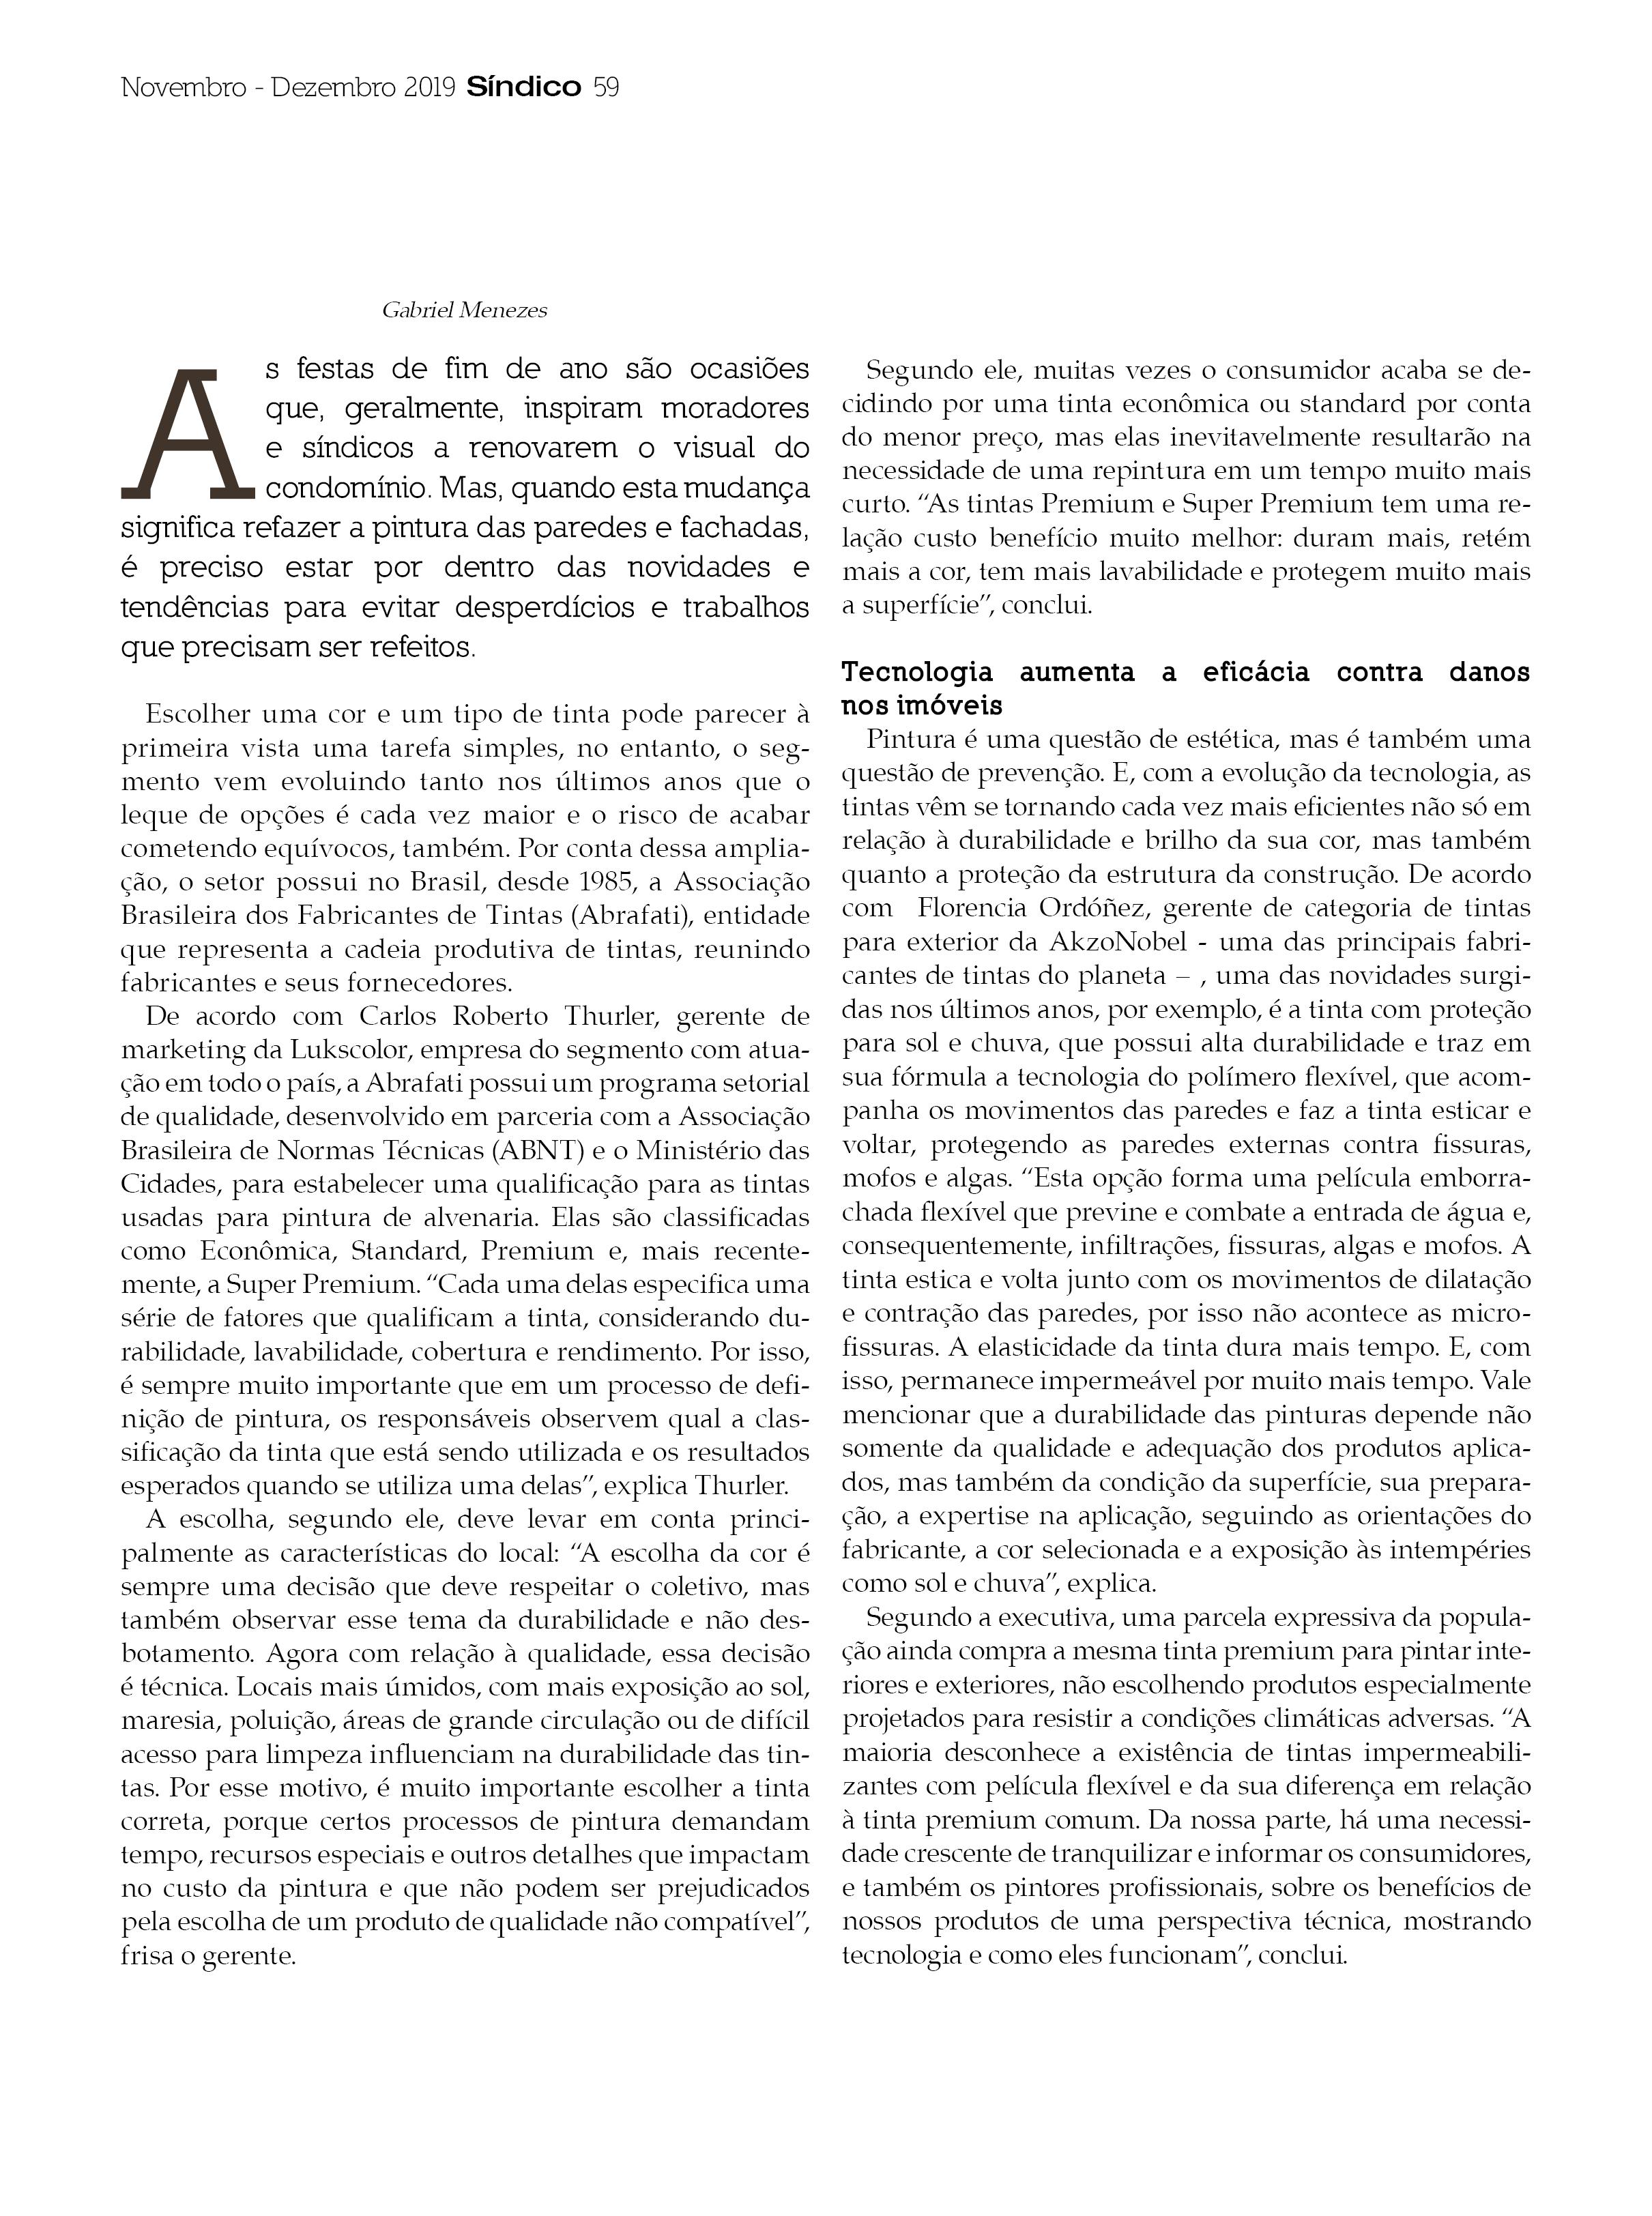 Revista Síndico_ed 247_57